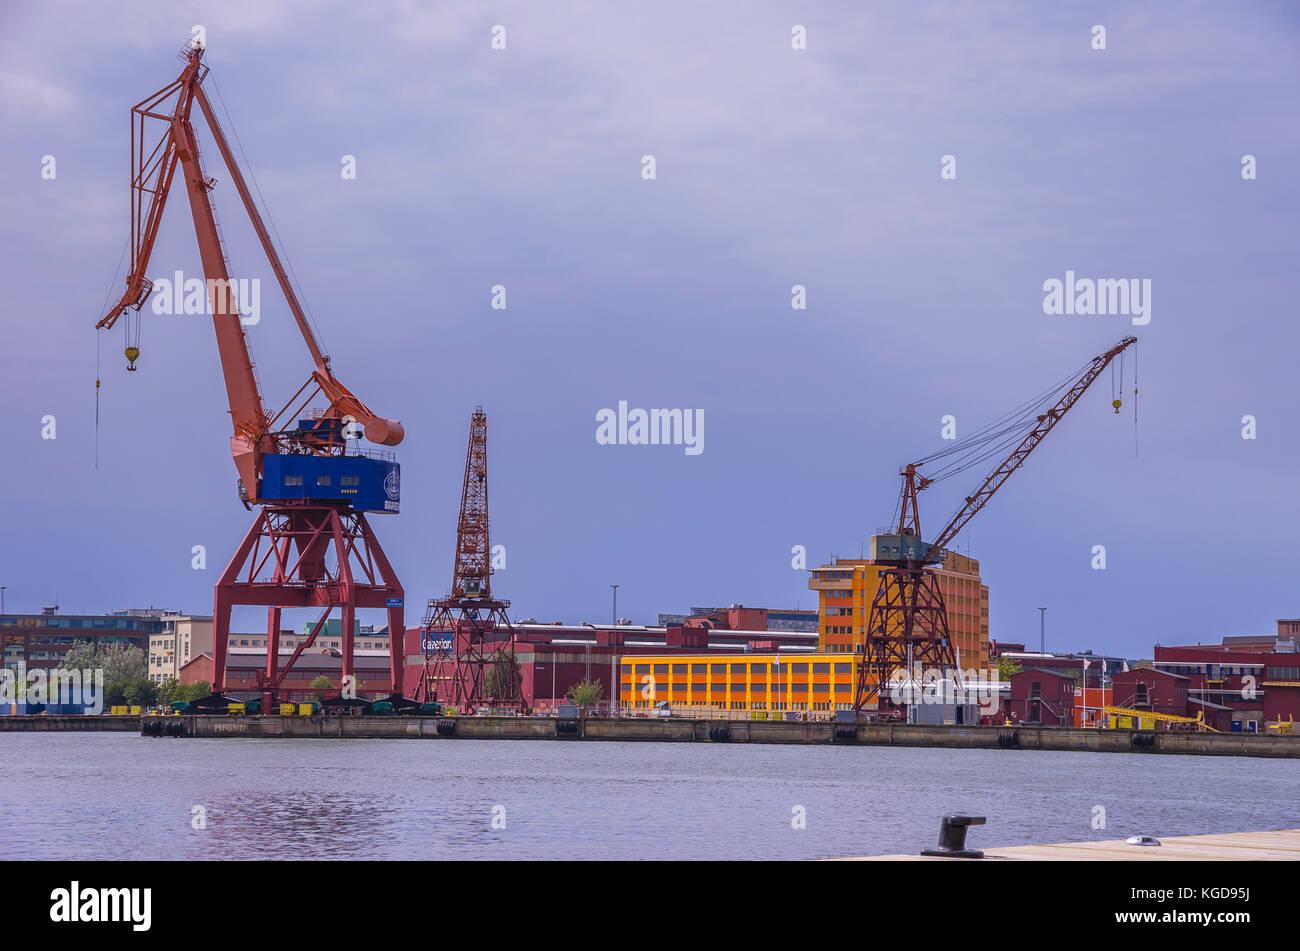 Dockside cranes in the harbor of Gothenburg, Bohuslän, Sweden. - Stock Image